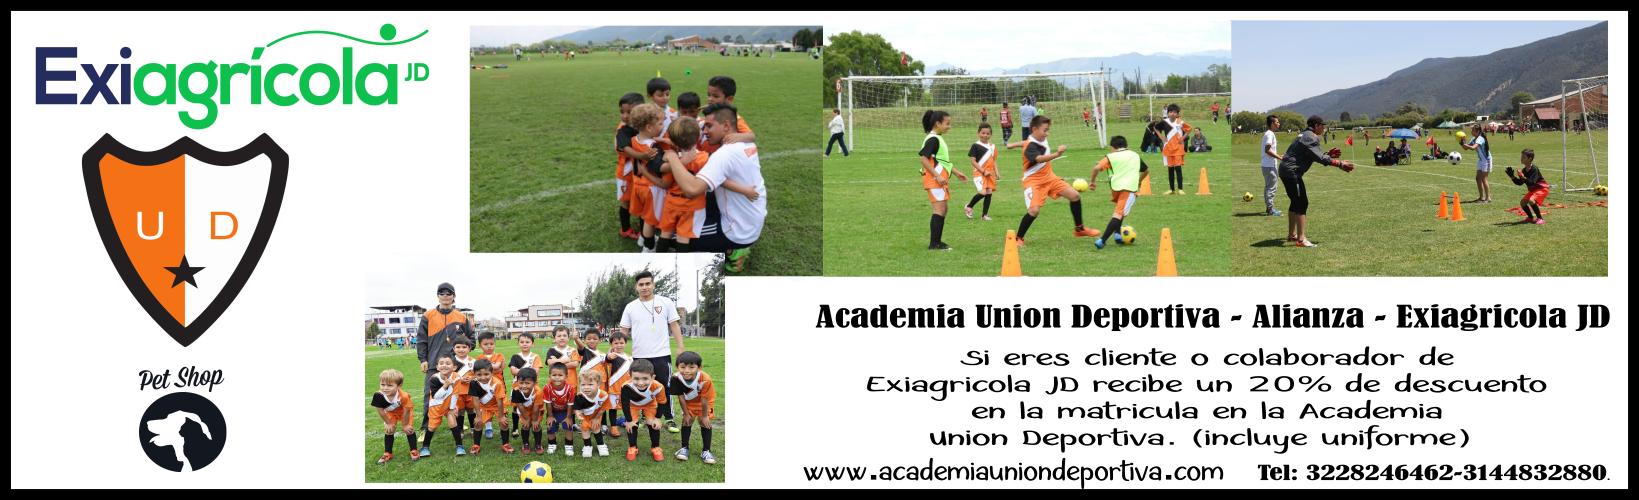 academia deportiva exiagricola_jd